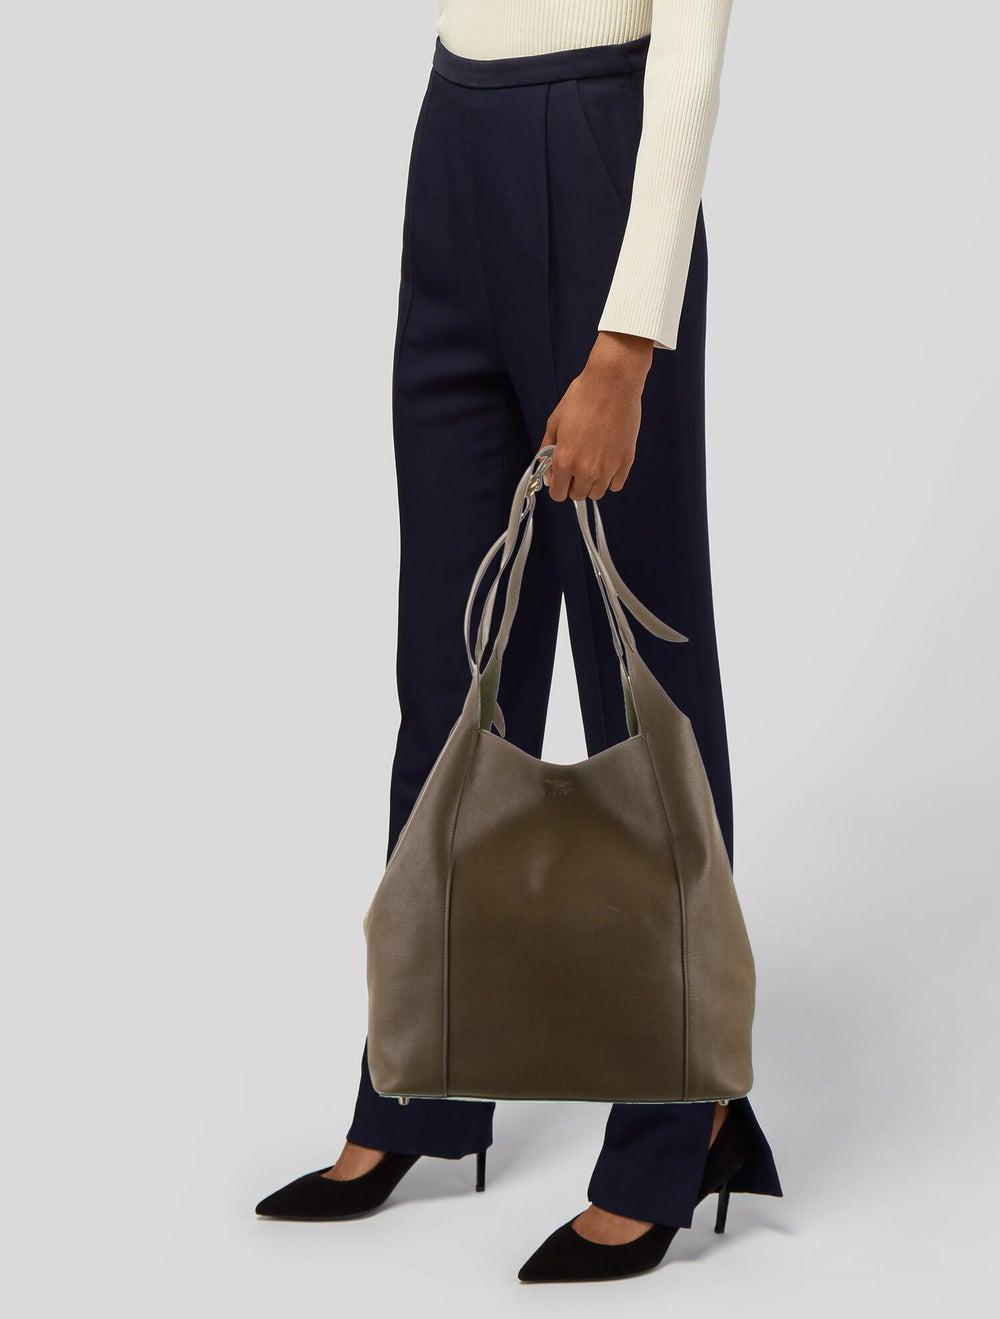 Nina Ricci Leather Tote Bag Brown - image 2